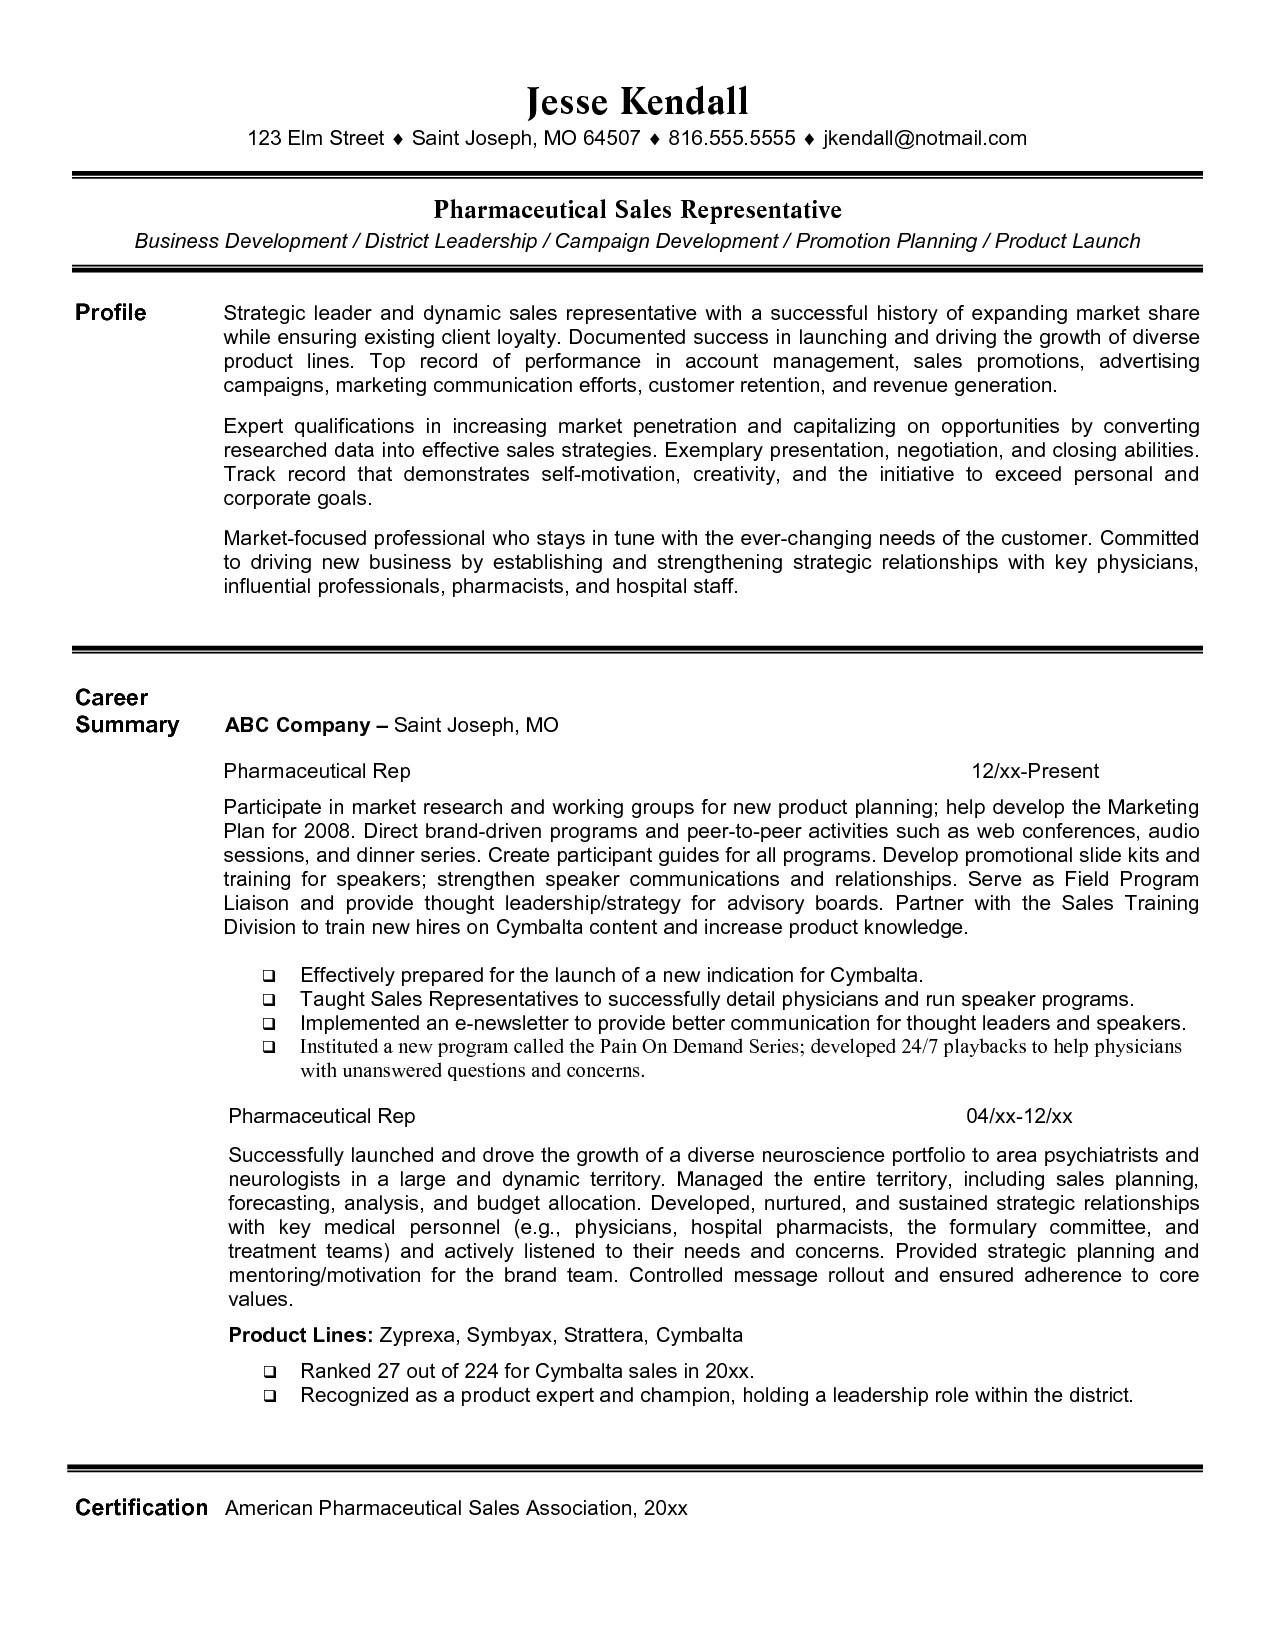 pharmaceutical sales resume entry level 2390